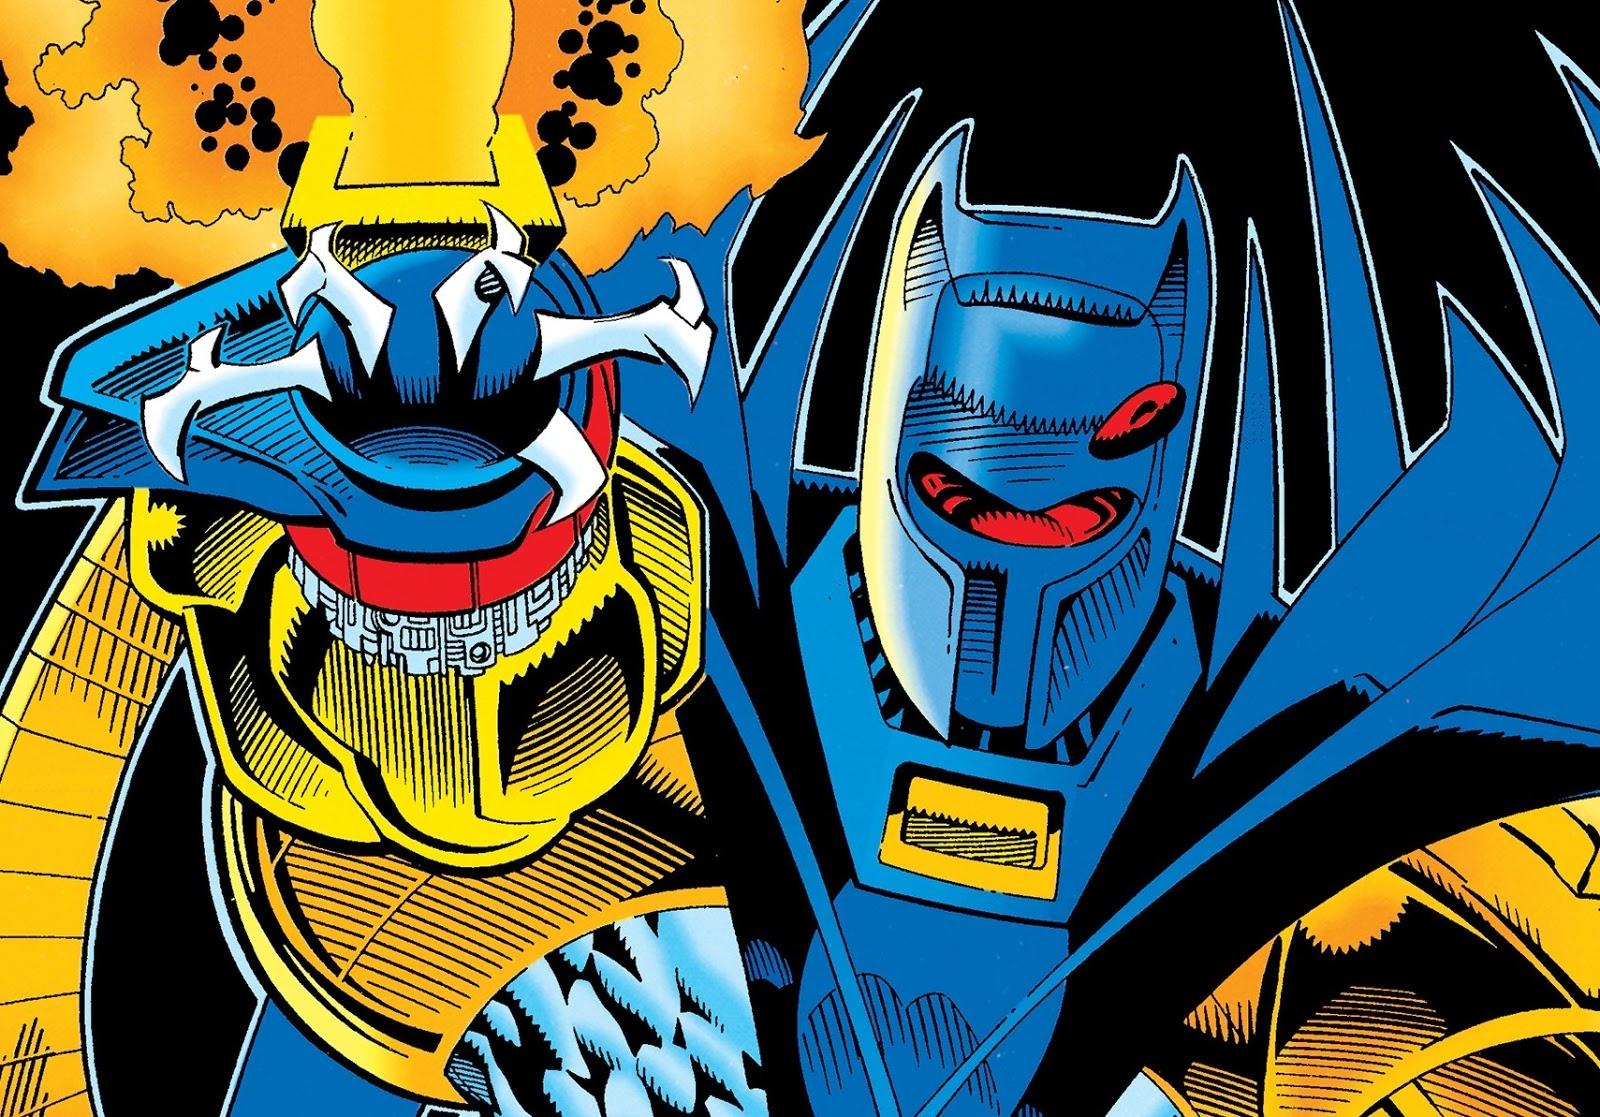 Costume Props Orderly Batman Cosplay Masks Eye Led Light Black Panther Helmet Diy Eyes Light Drop Ship Fine Quality Novelty & Special Use